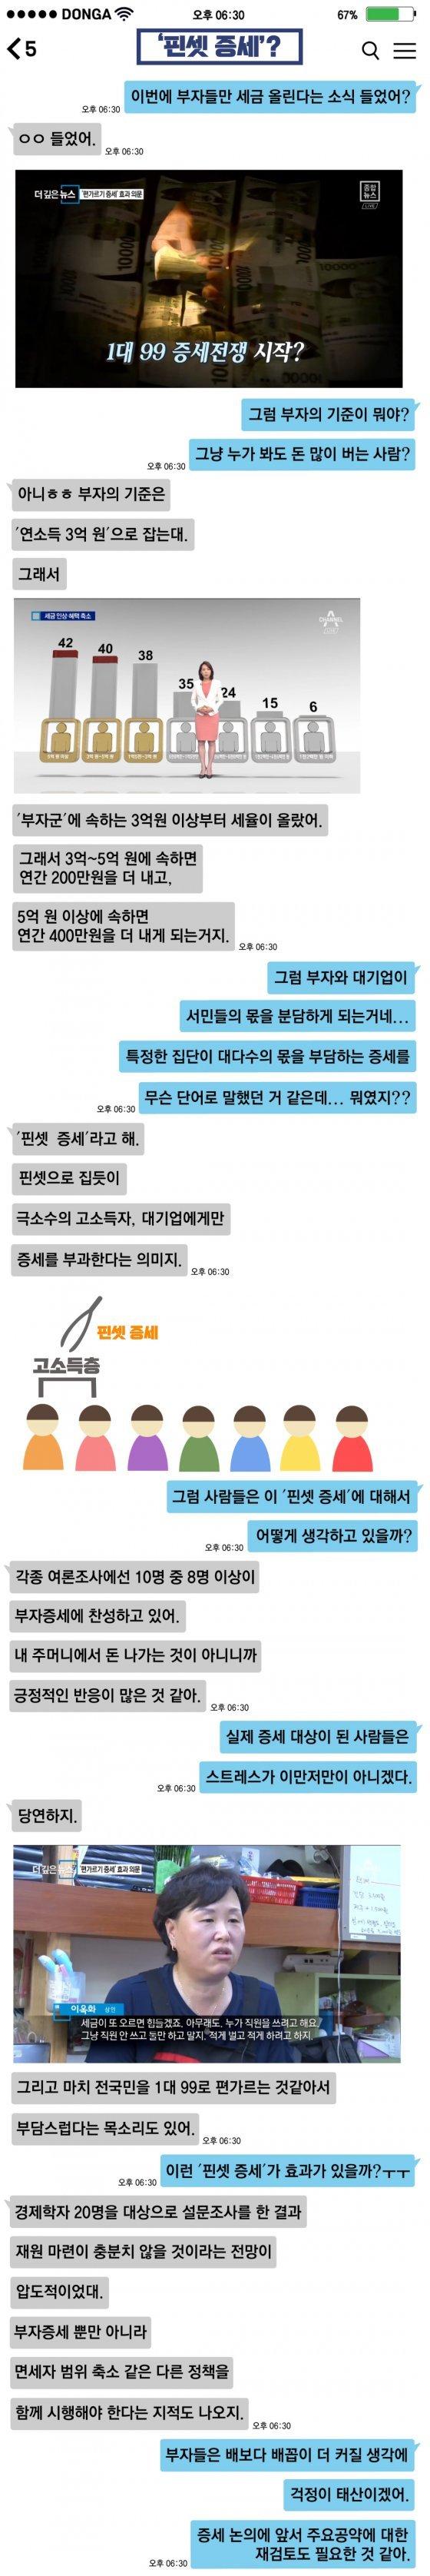 [d이슈]文정부 첫 세법개정안, 부자들만 '핀셋 증세' 논란